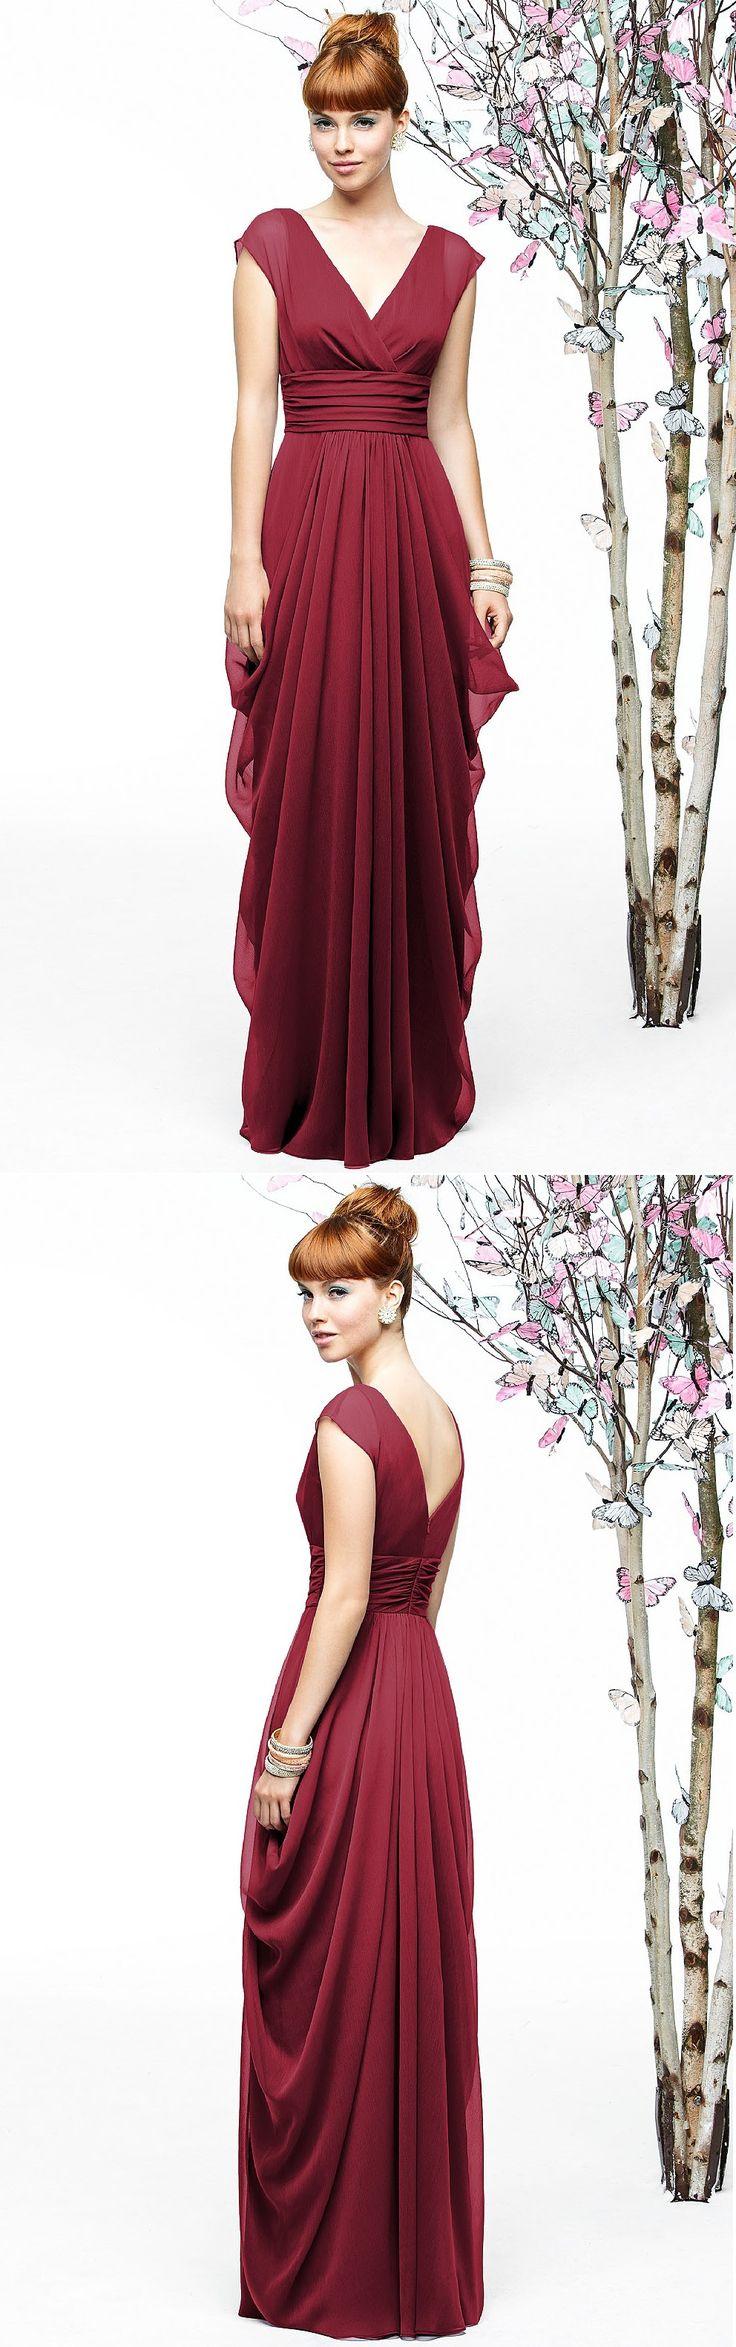 Empire A-line Cap Sleeves Floor-length Zipper Bridesmaid Dresses